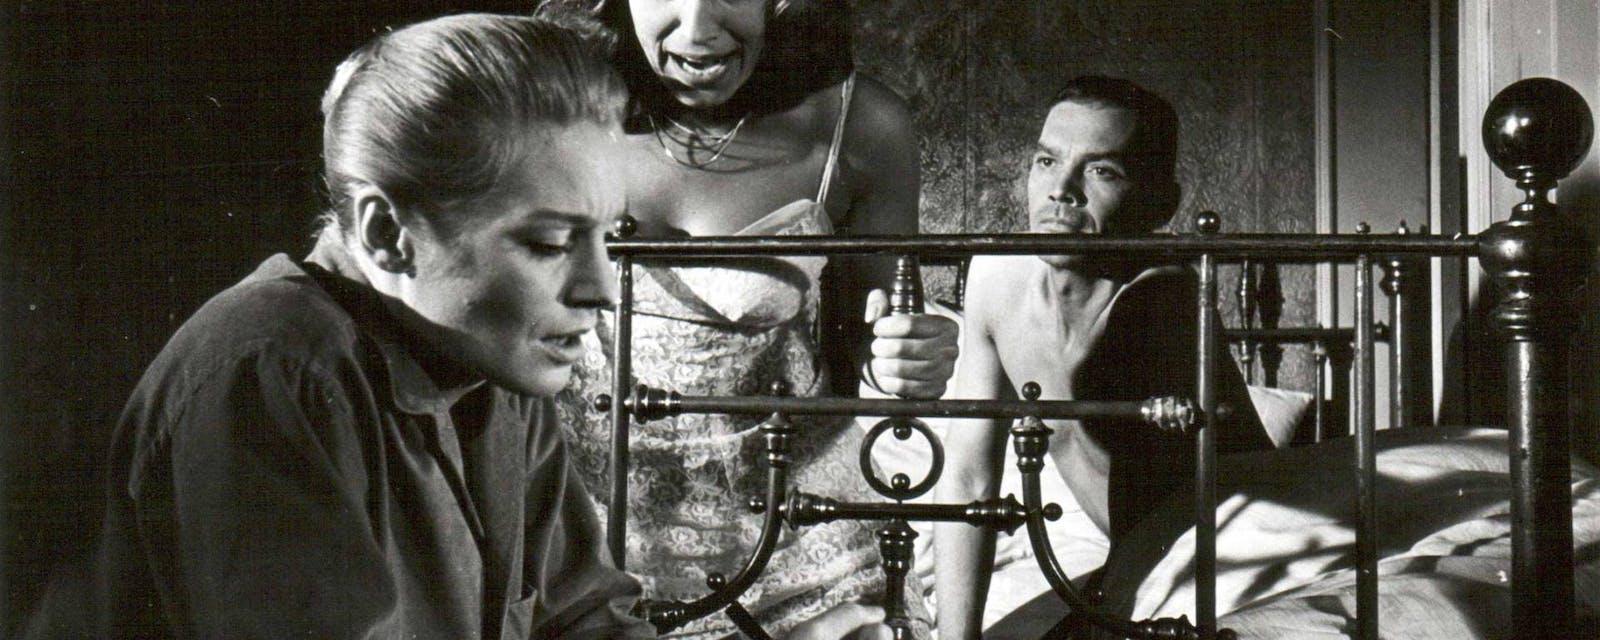 Stillbild ur Ingmar Bergmans Tystnaden.